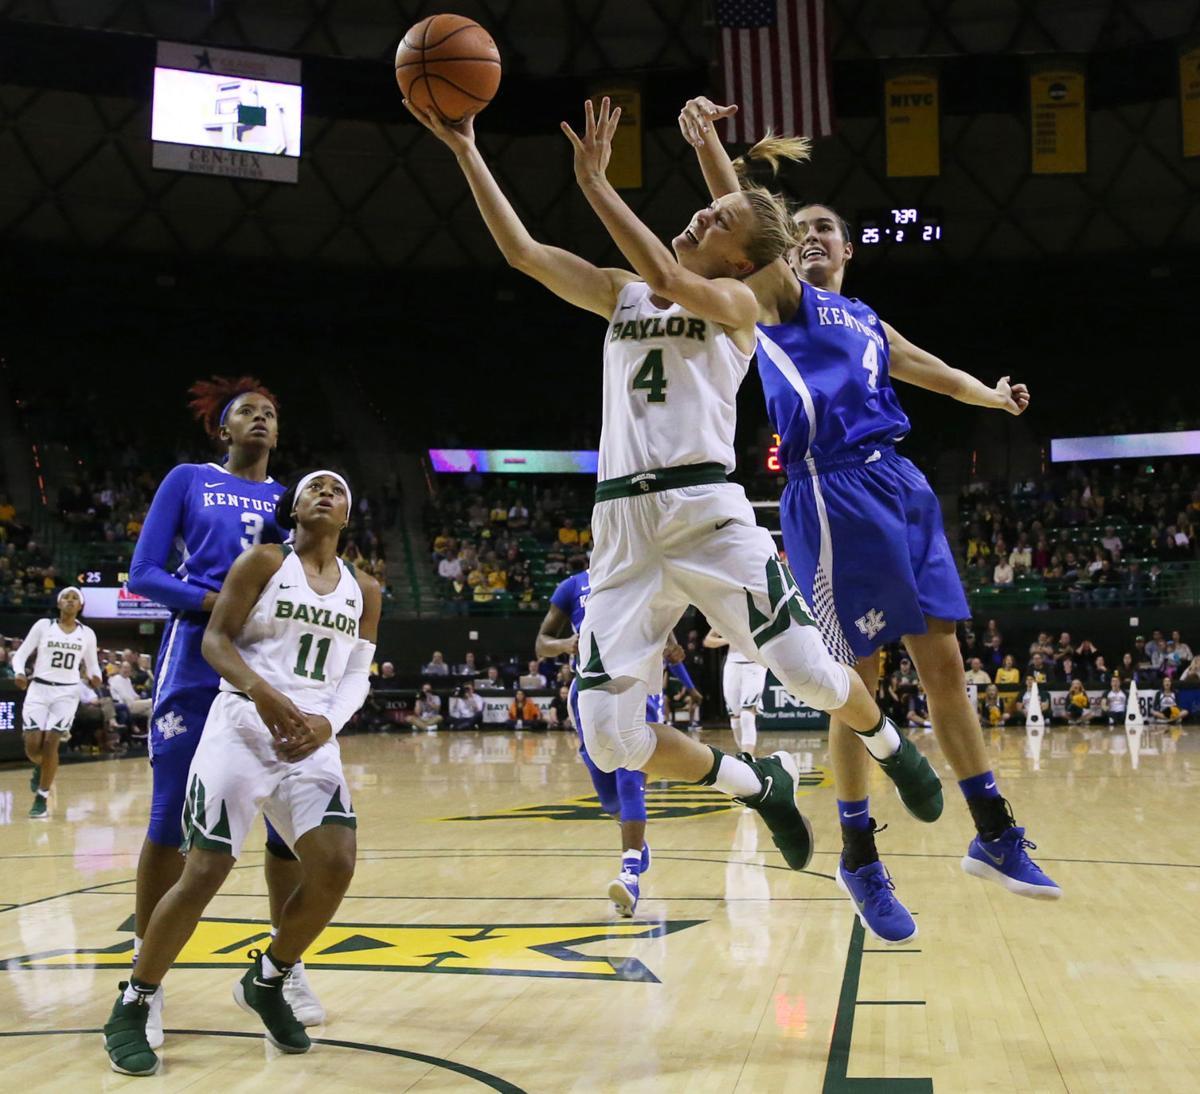 Kentucky Baylor Basketball